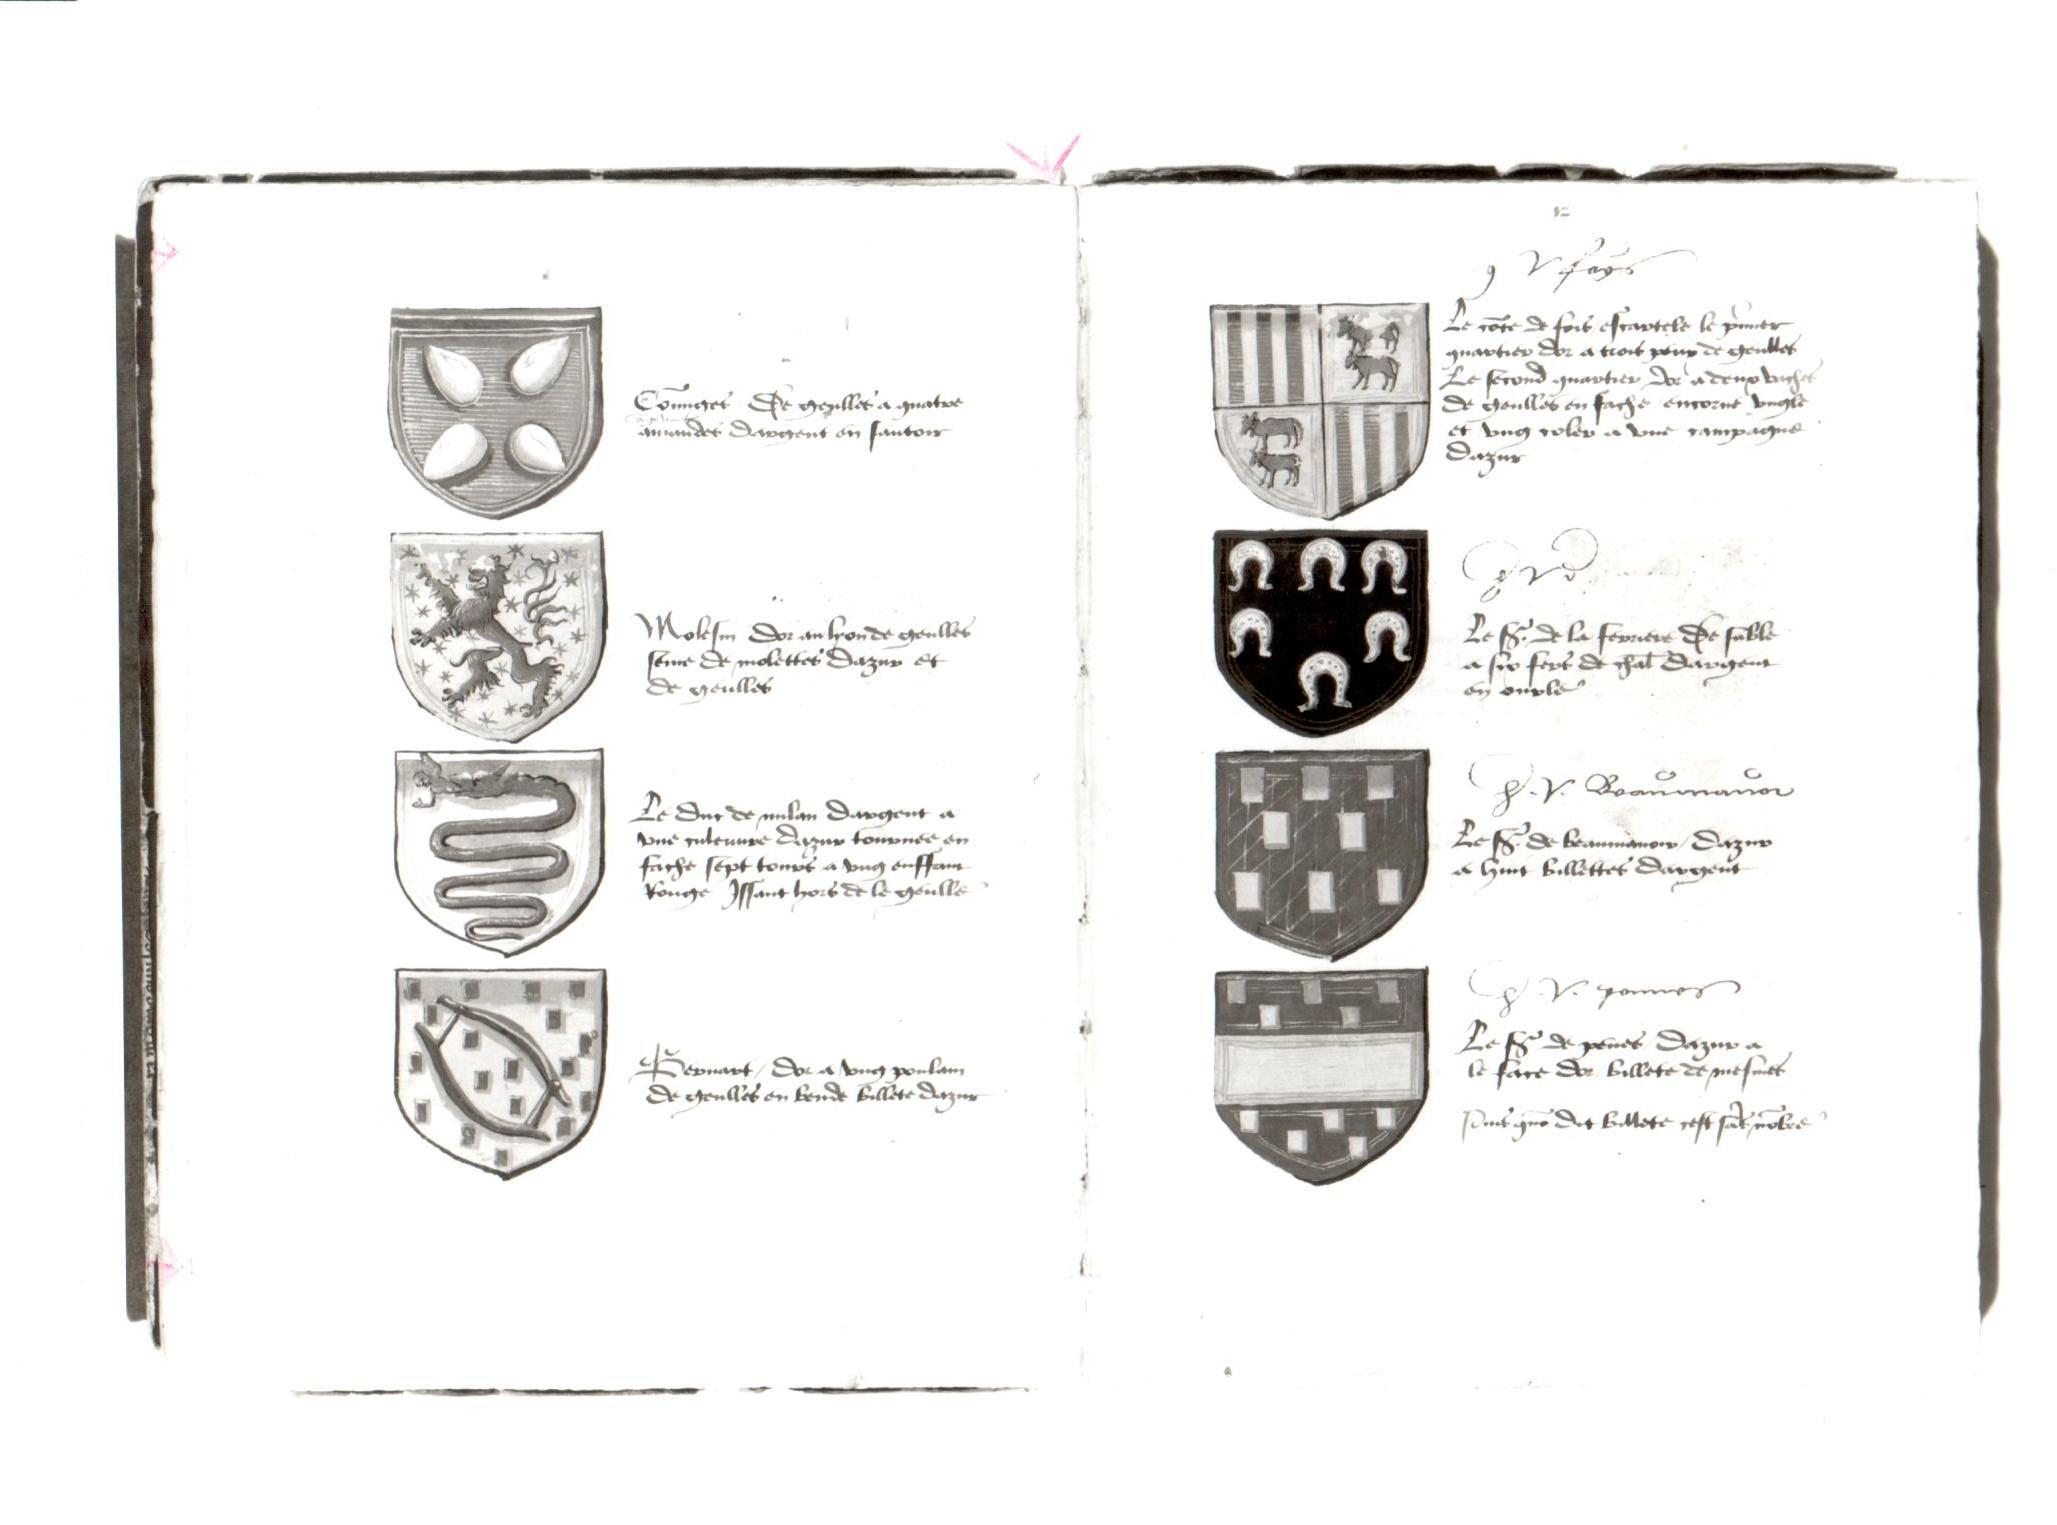 96. Beinecke MS 648, ff. 11v-12r.